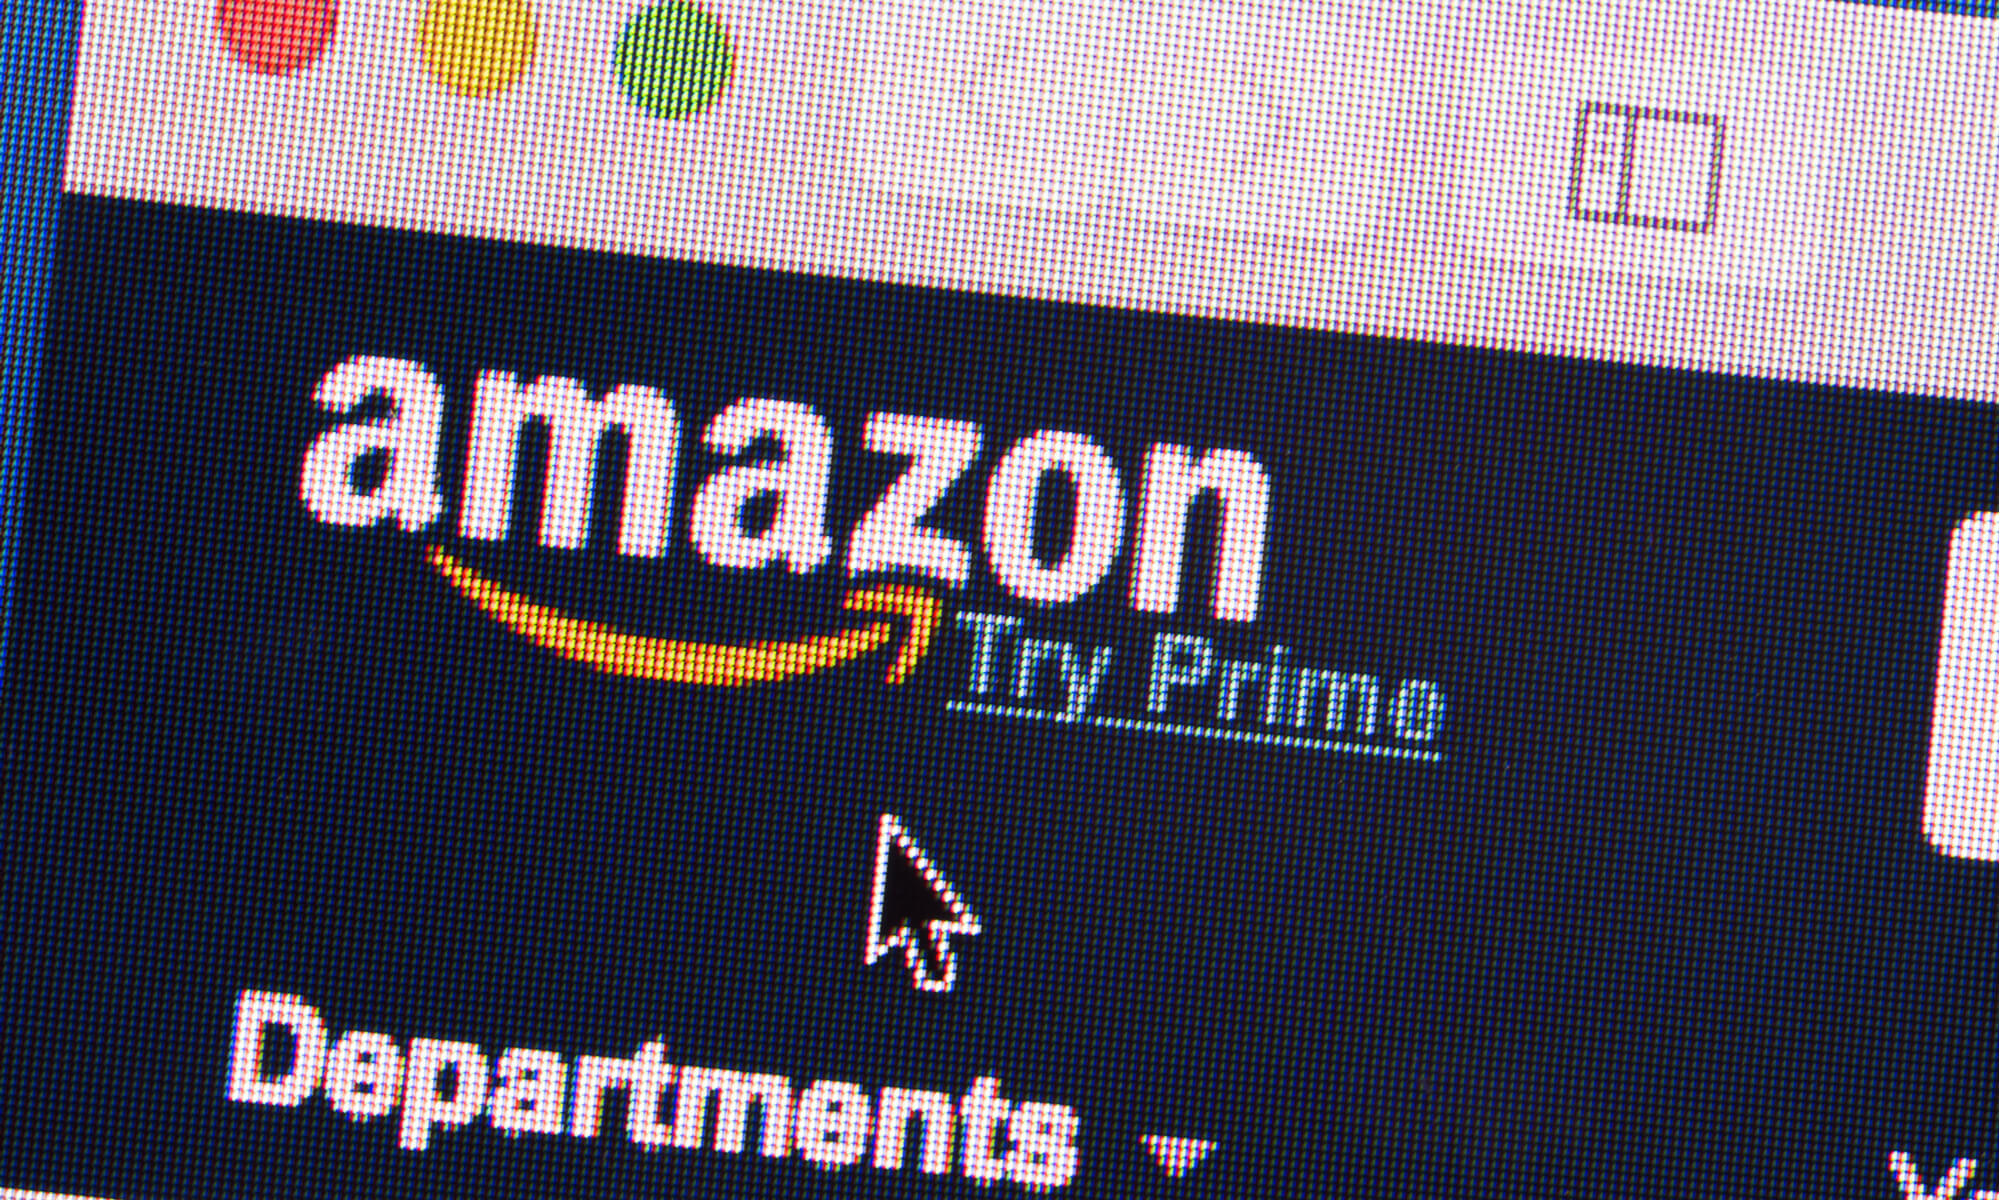 How to setup your Amazon account